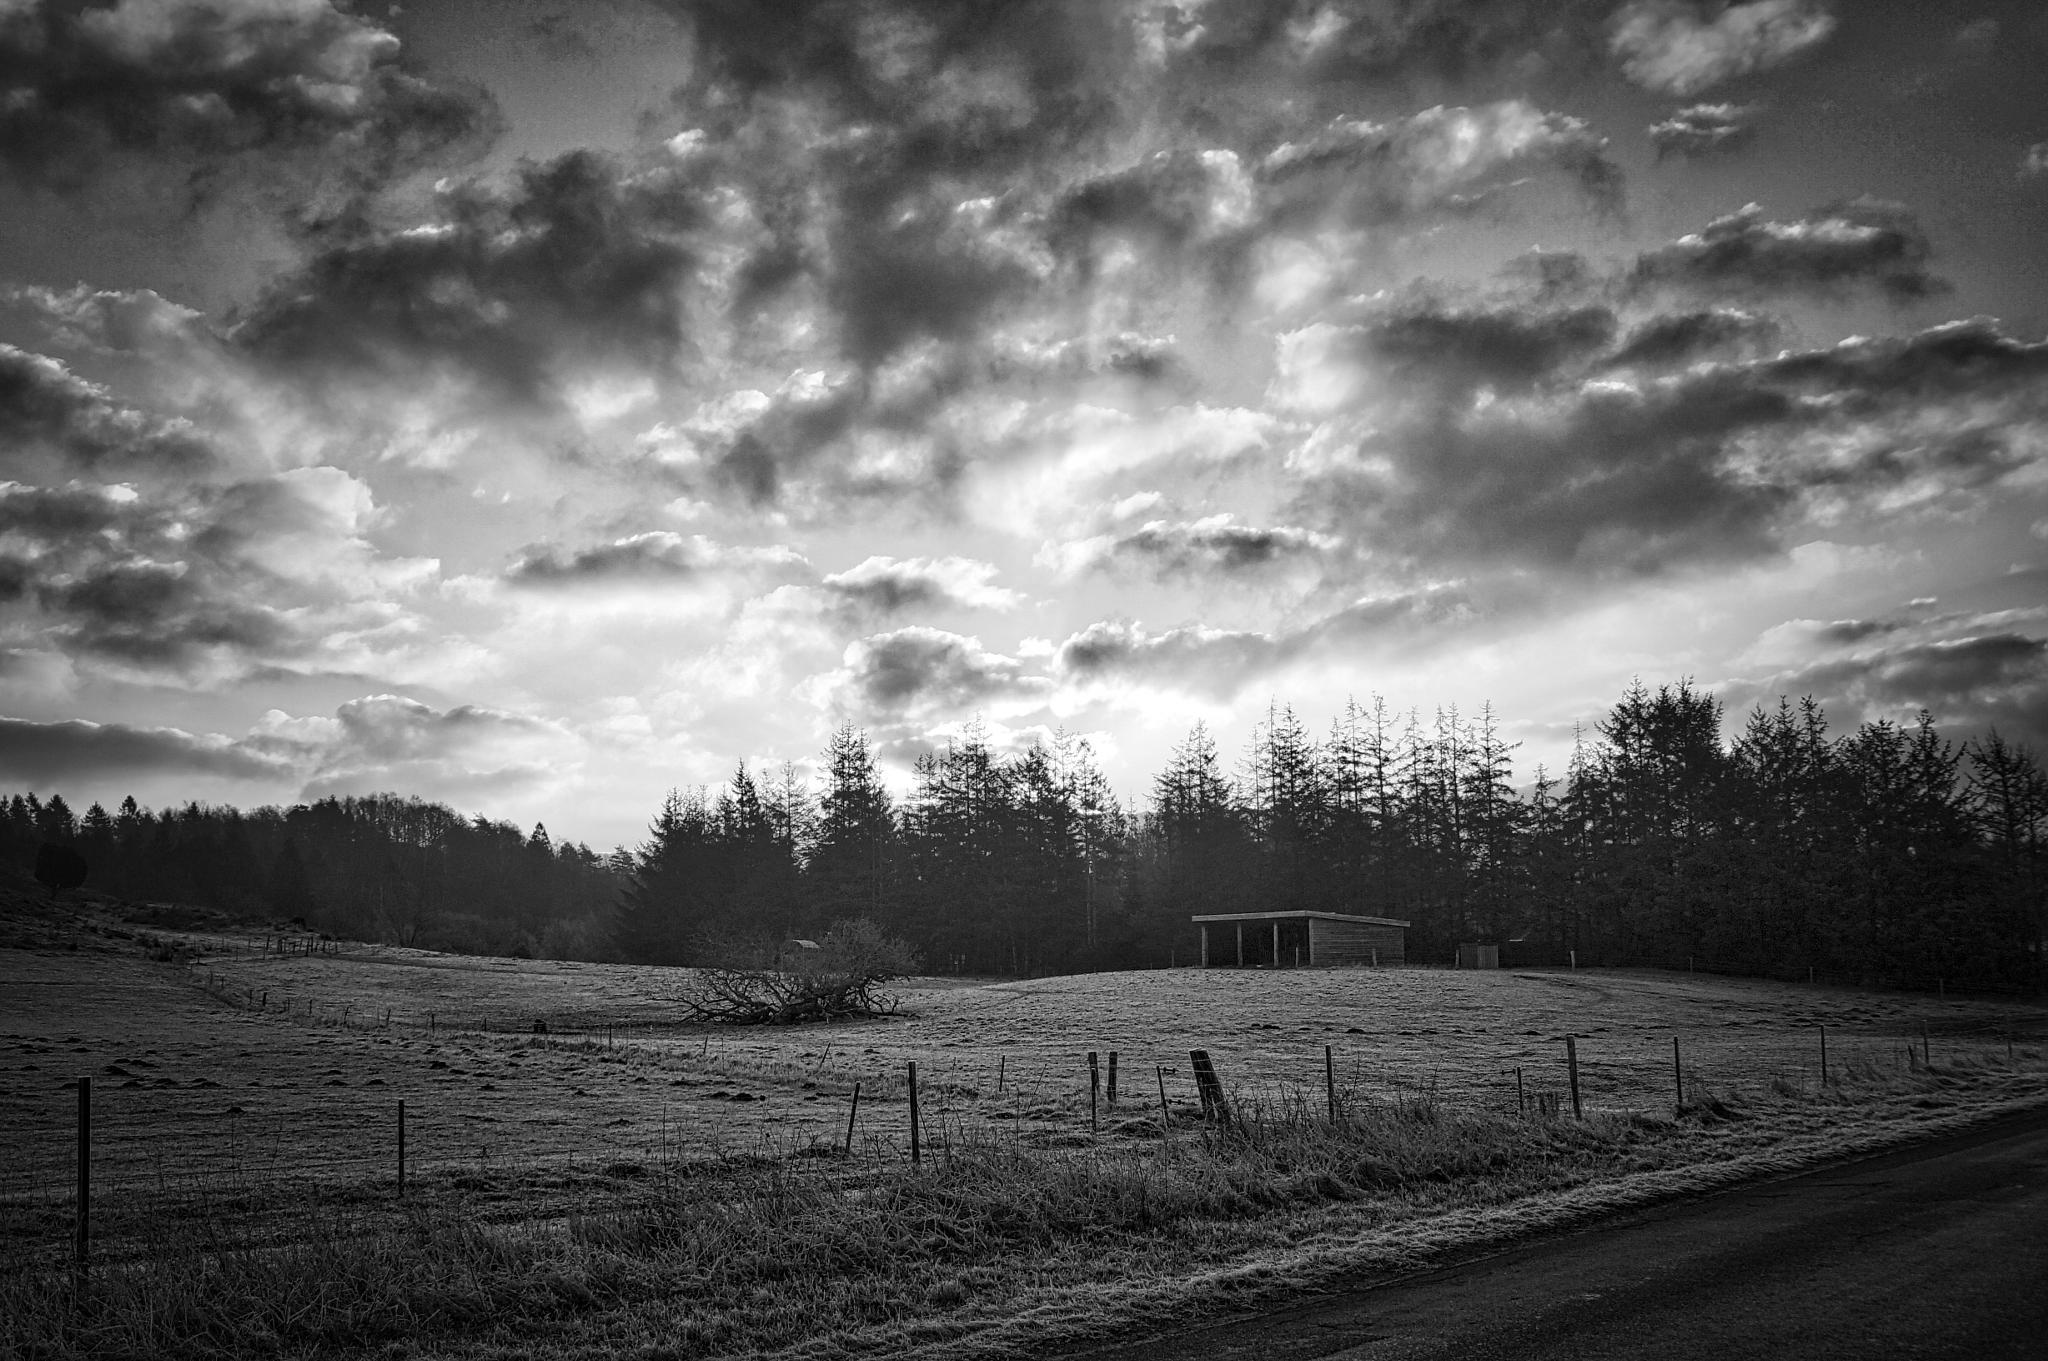 Morning BW by MollerNielsen